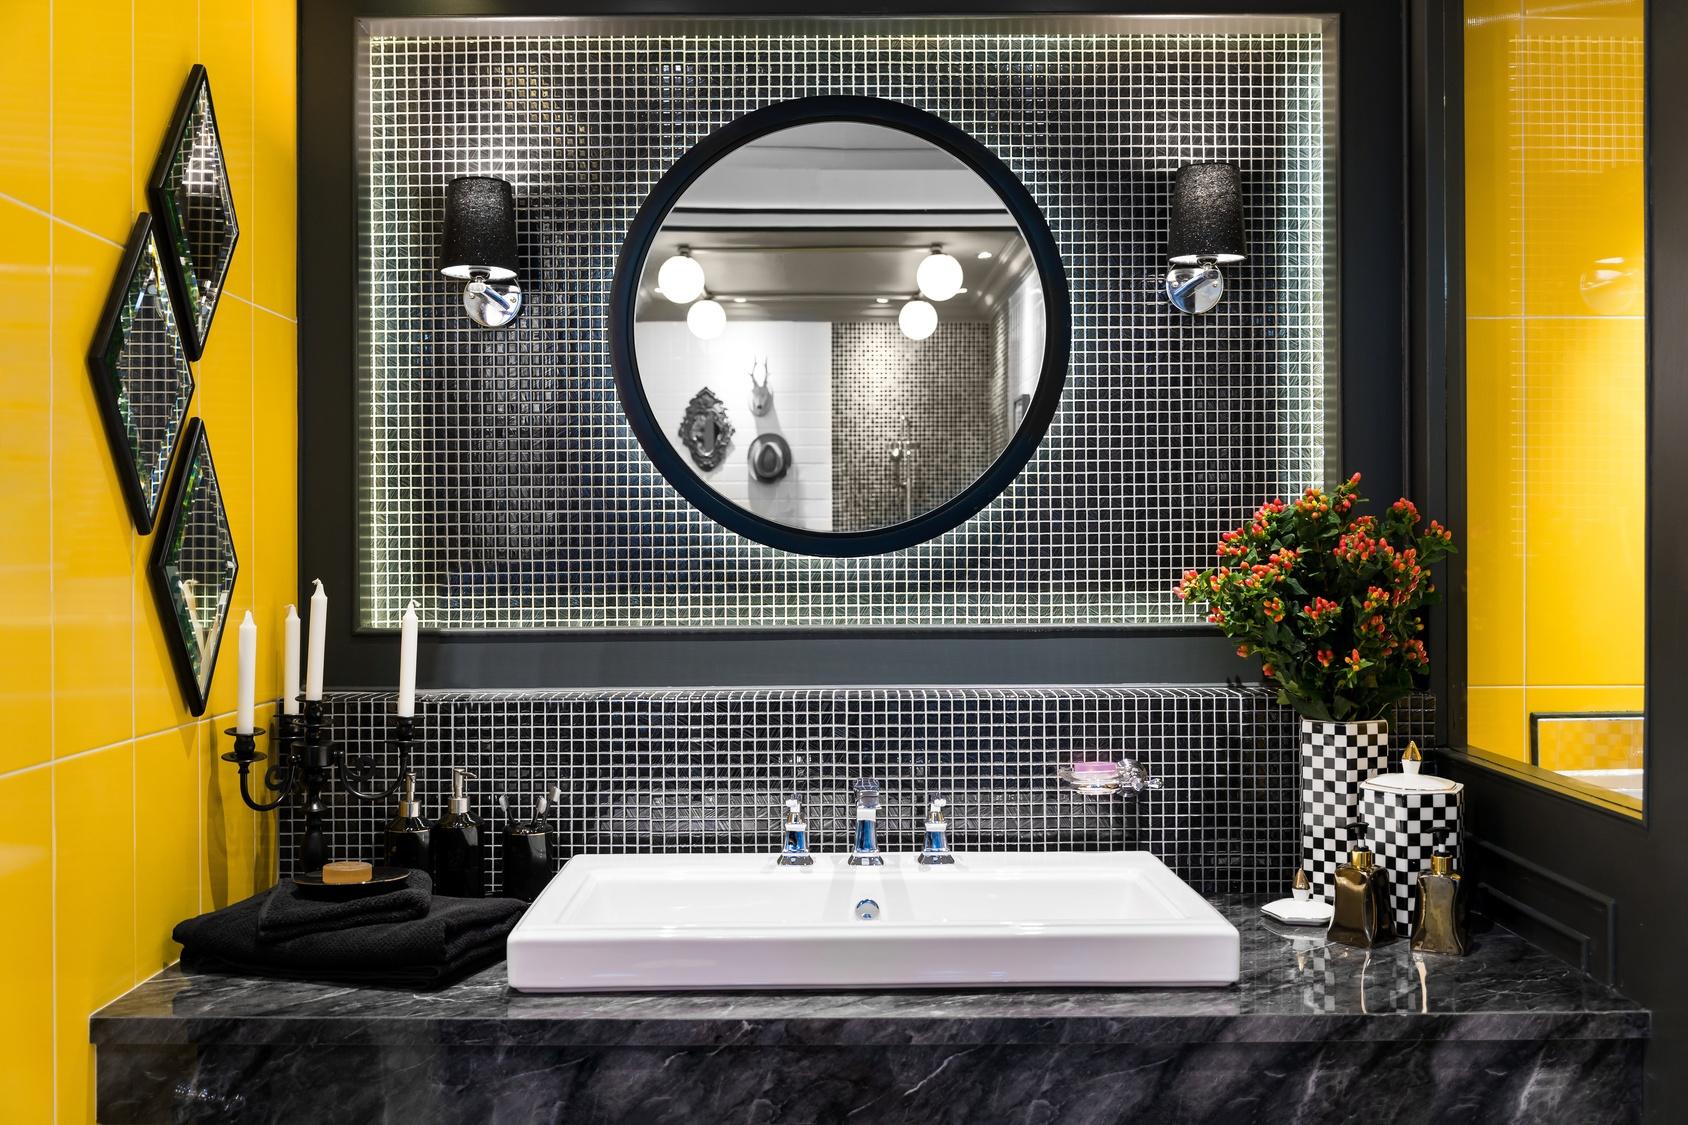 Bathroom Remodeling Marietta Ga bathroom designs | marietta & roswell ga | atlanta tile experts